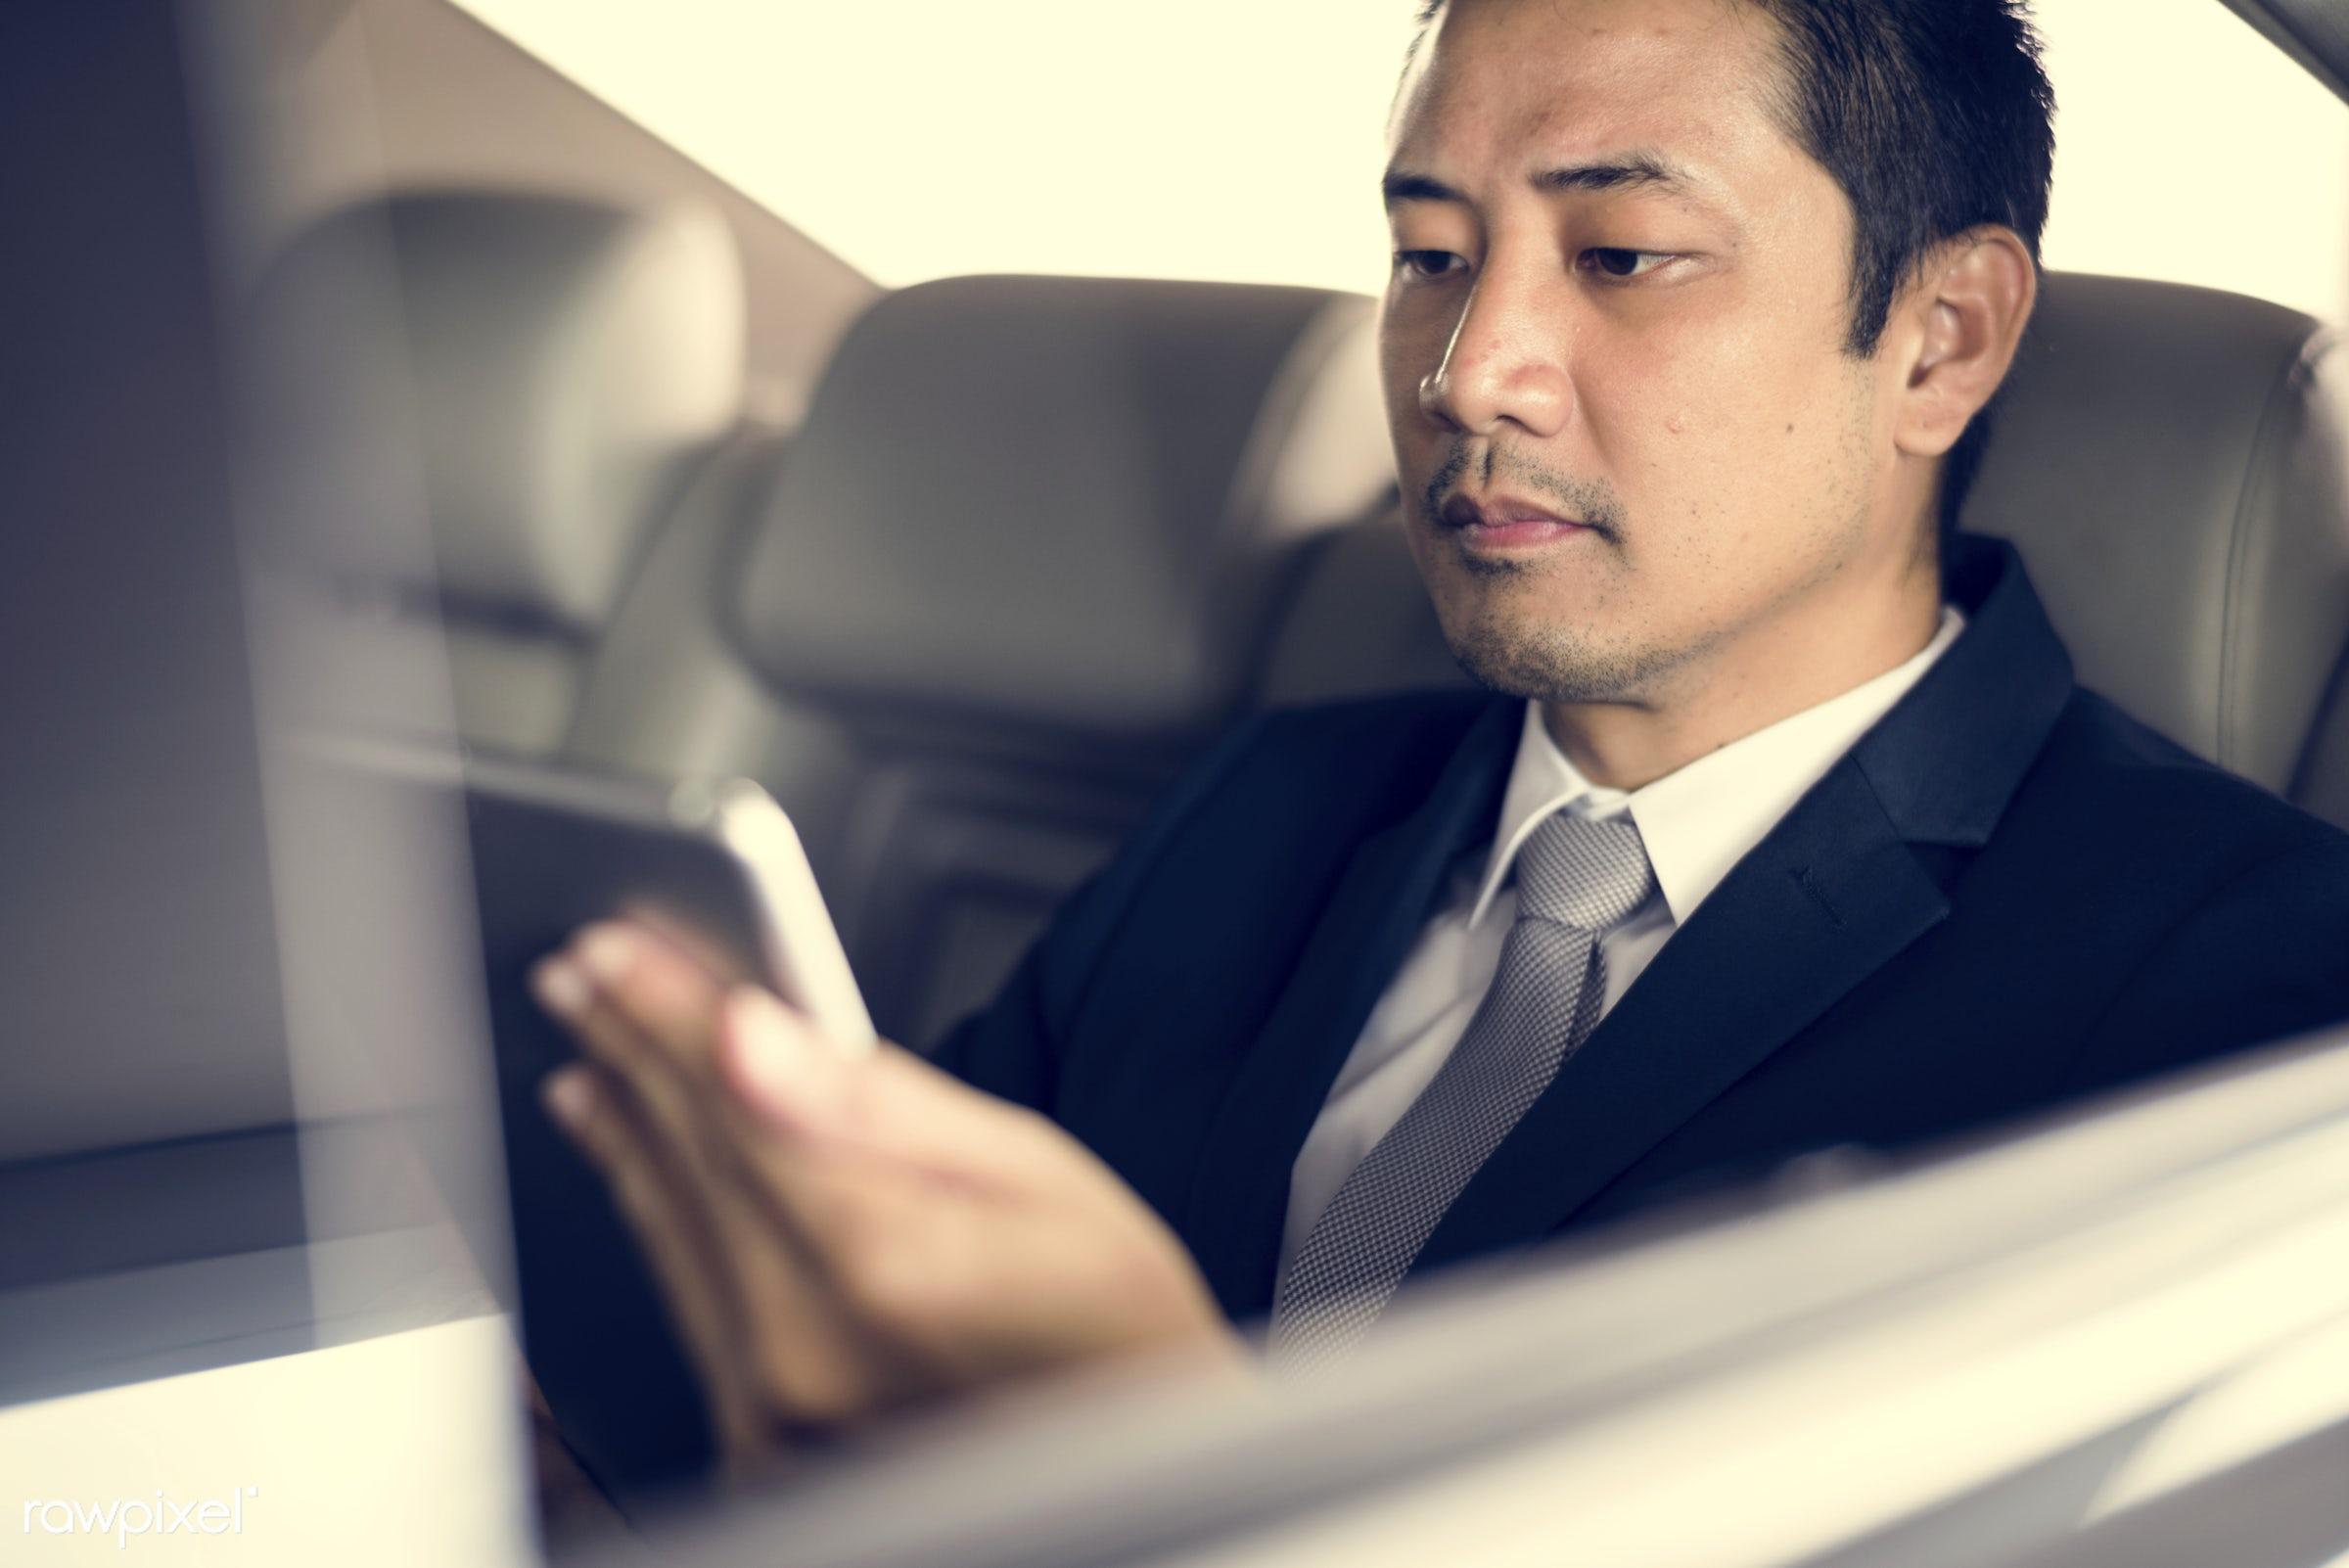 adult, back seat, business, businessman, businessmen, candid, car, cellphone, communication, corporate, device, digital...